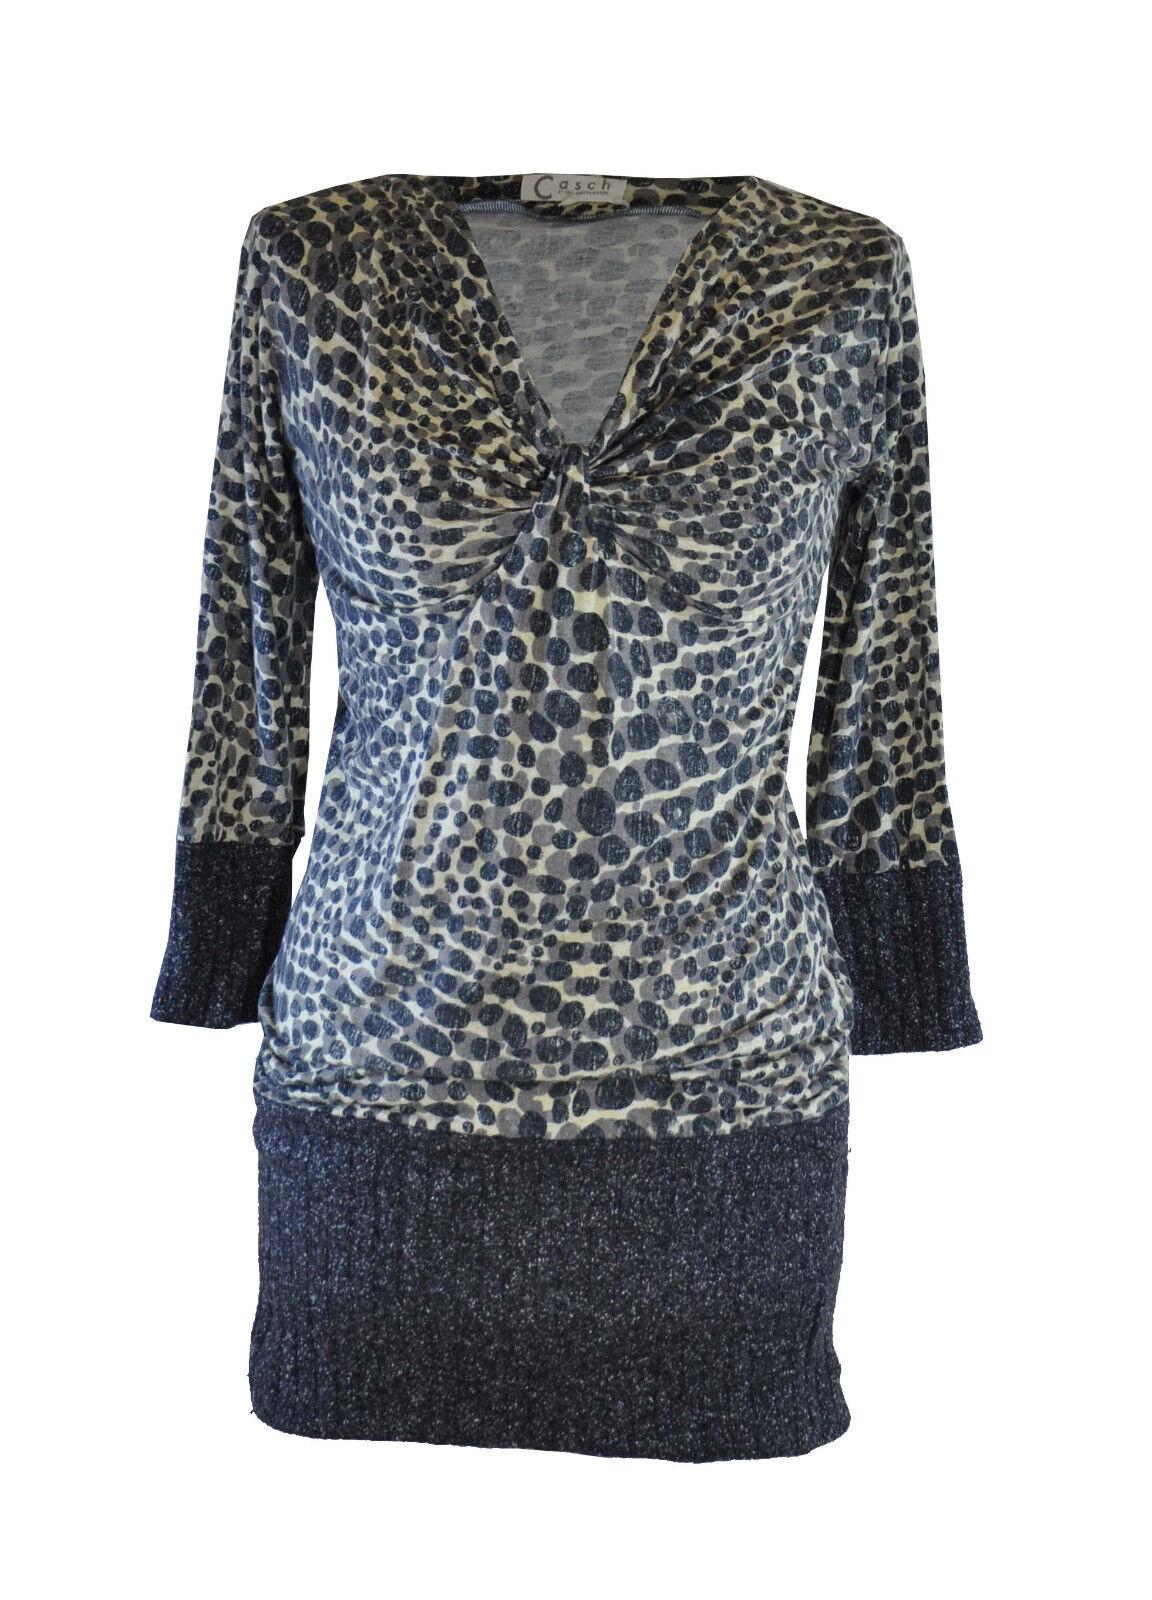 Casch by Gro Abrahamsson  Grey & Beige Long Top   Dress  36